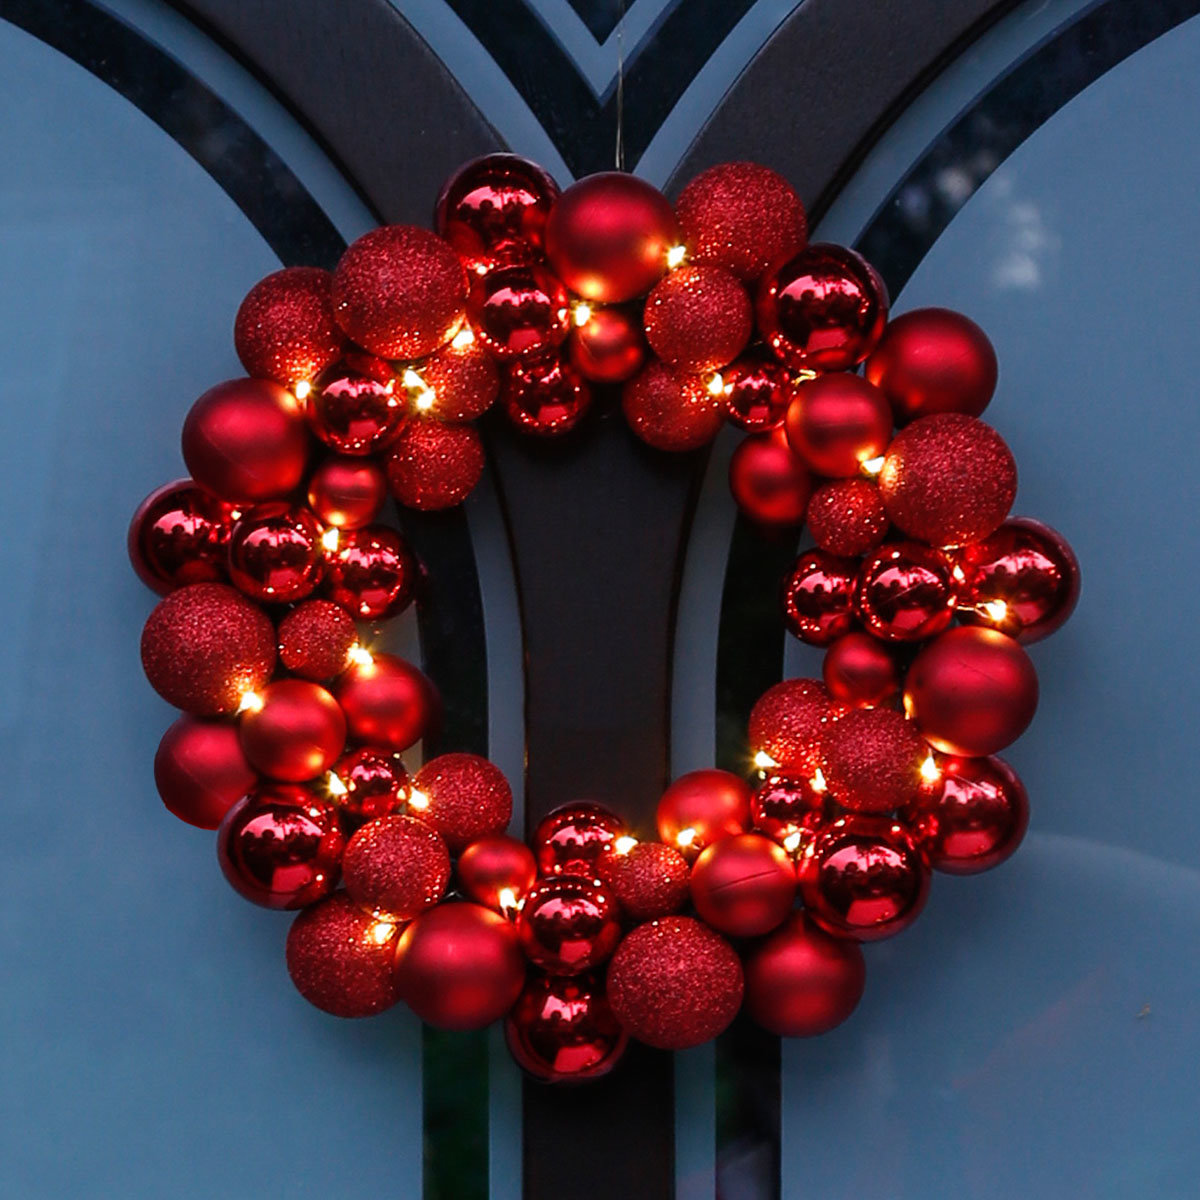 Shoprite Christmas Lights: LED-Türkranz Christmas Time Online Kaufen Bei Gärtner Pötschke